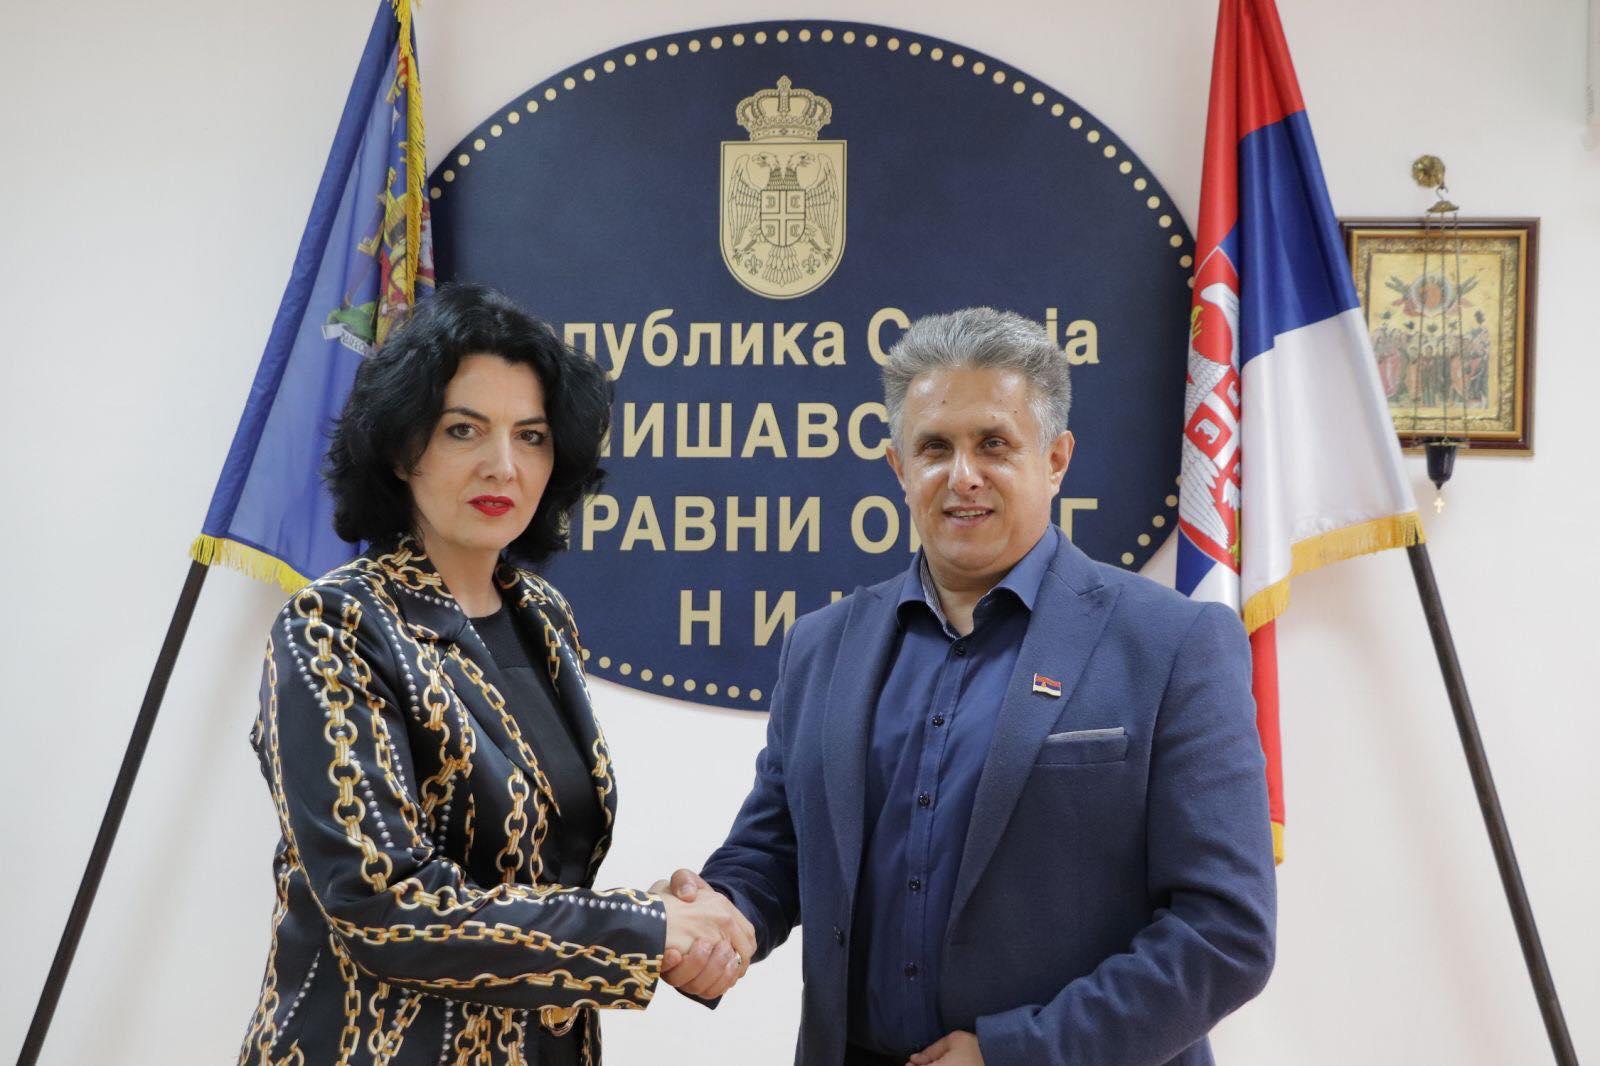 Сотировски и Милетић, фото: Нишавски управни округ, С.Д.